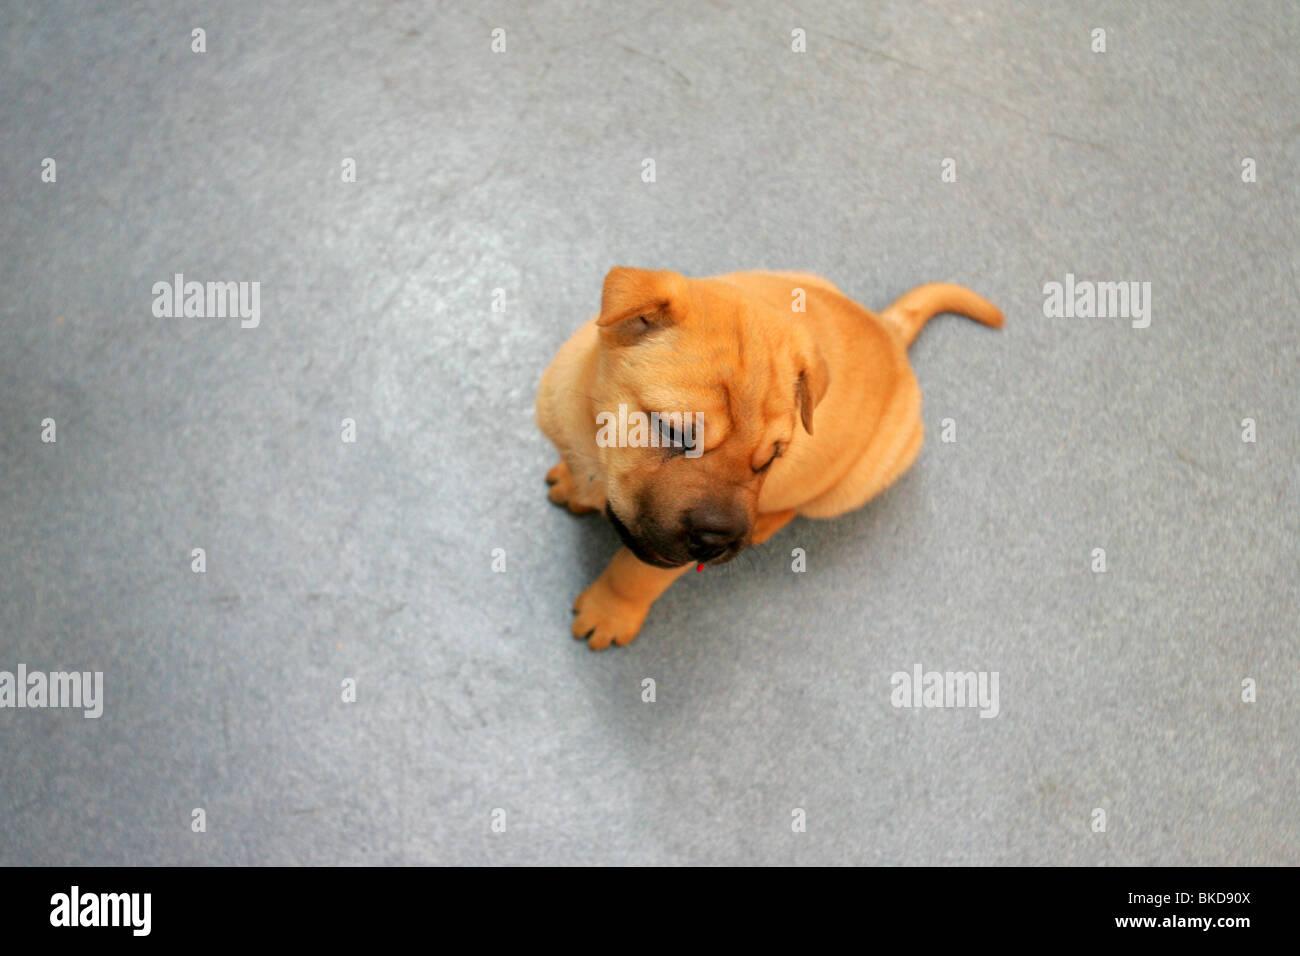 Shar Pei puppy baby on the floor. - Stock Image